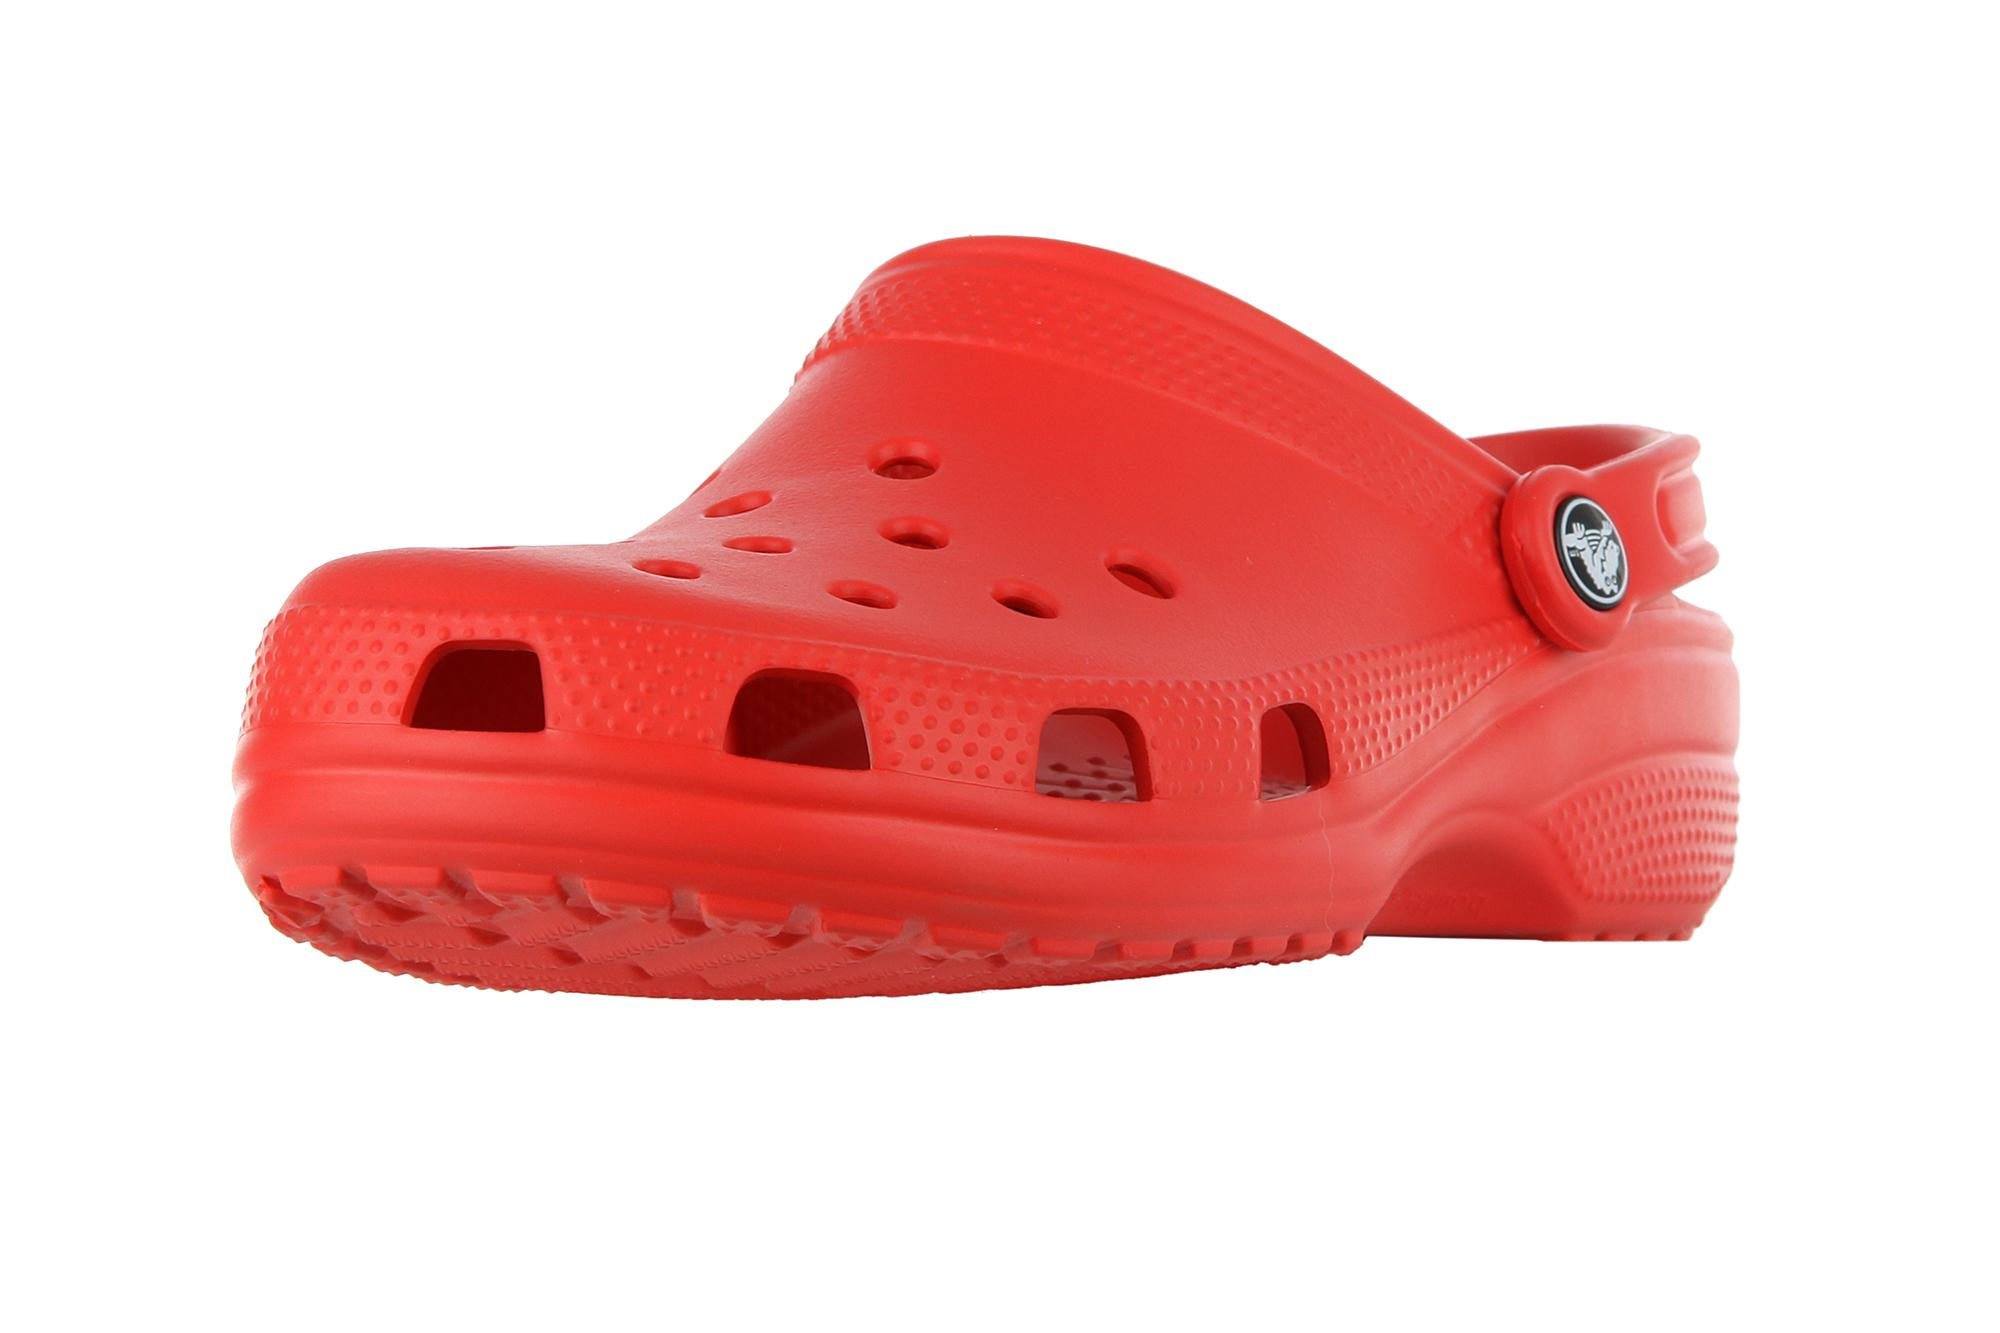 Crocs Foto Rojo43 498275 Classic Sandalias 44 VSMpUz